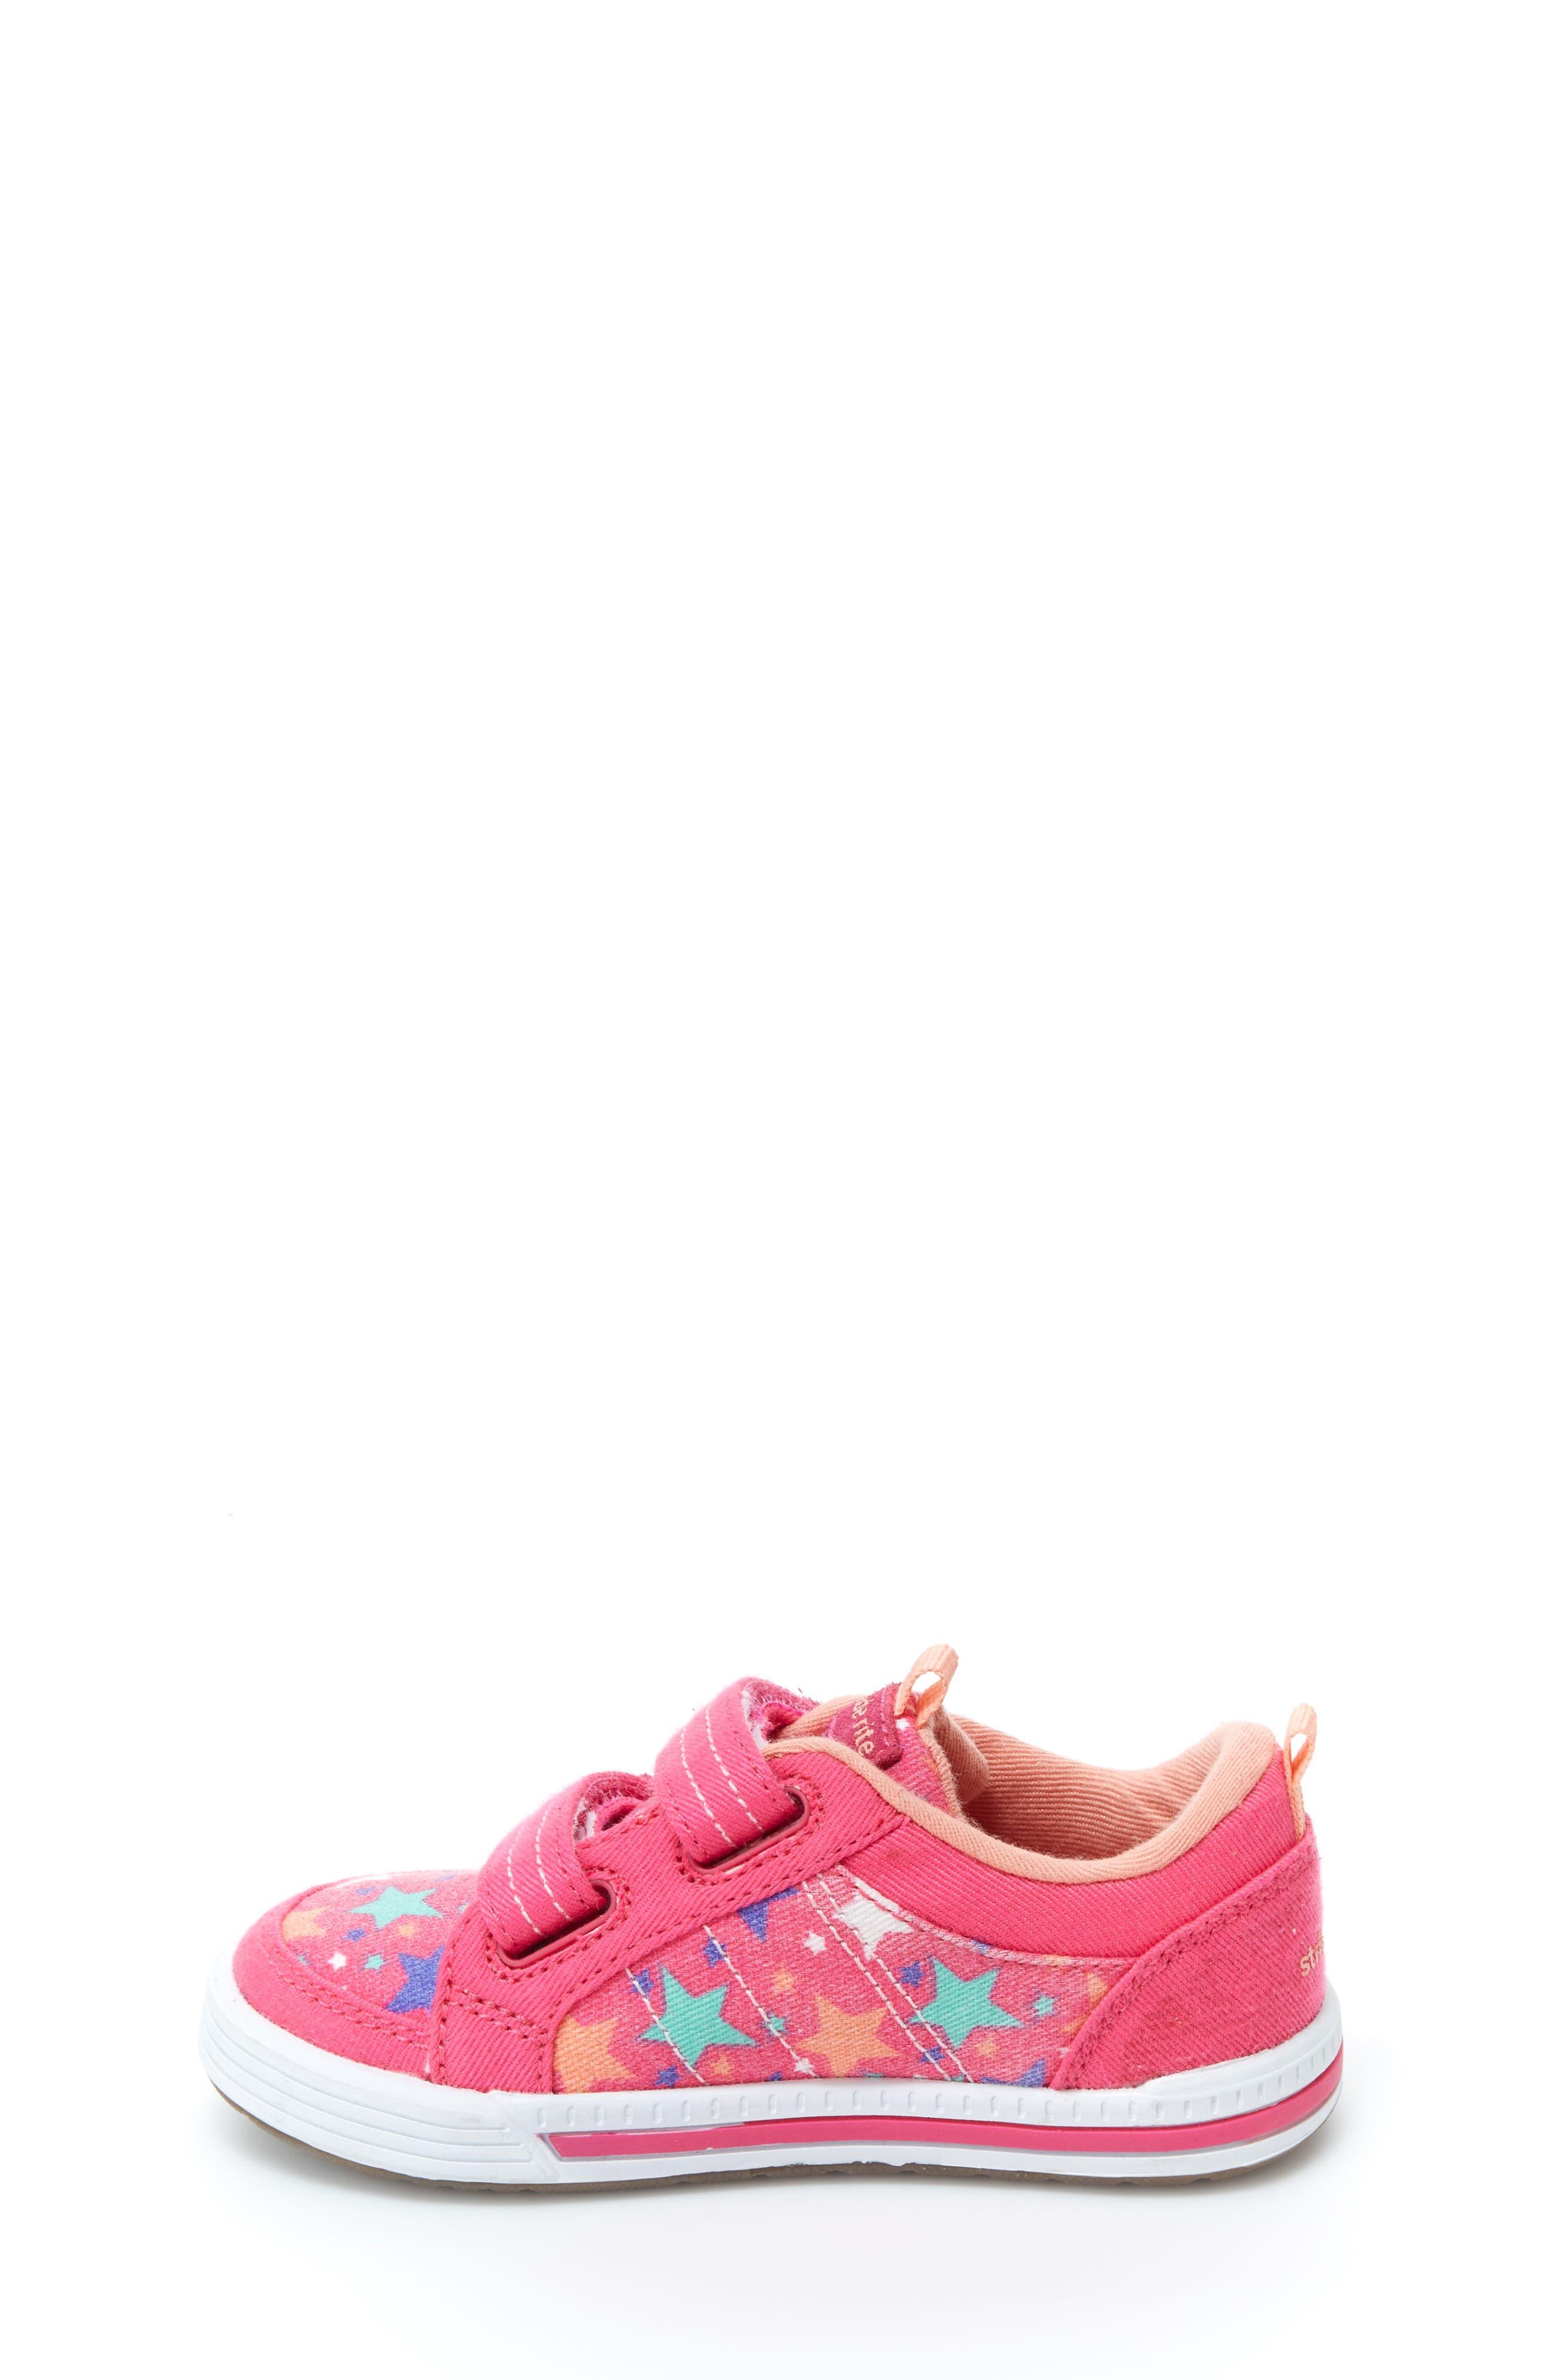 Logan Patterned Sneaker,                             Alternate thumbnail 7, color,                             650